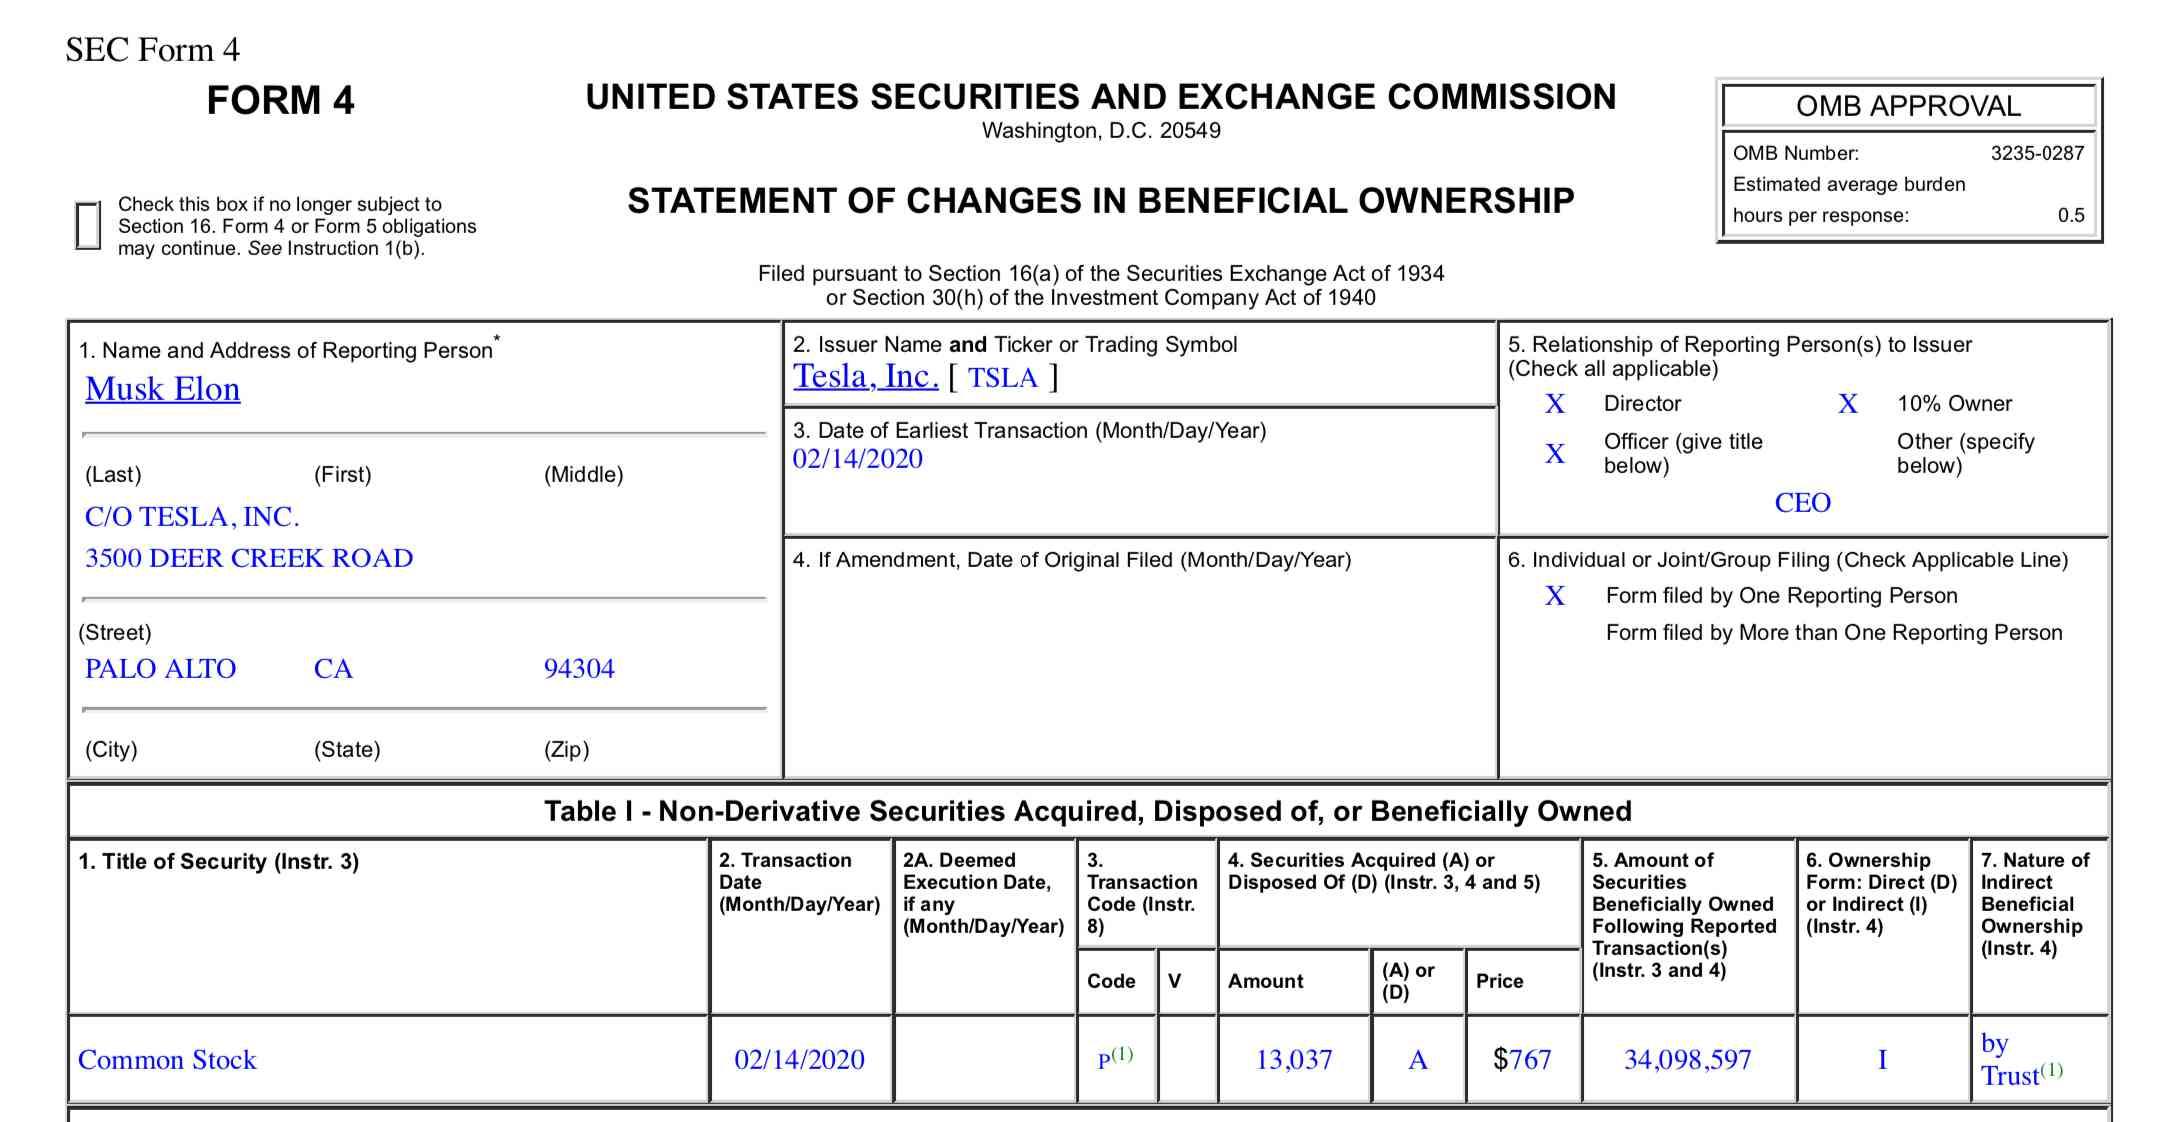 SEC Form 4 Example Elon Musk CEO of Tesla Inc.